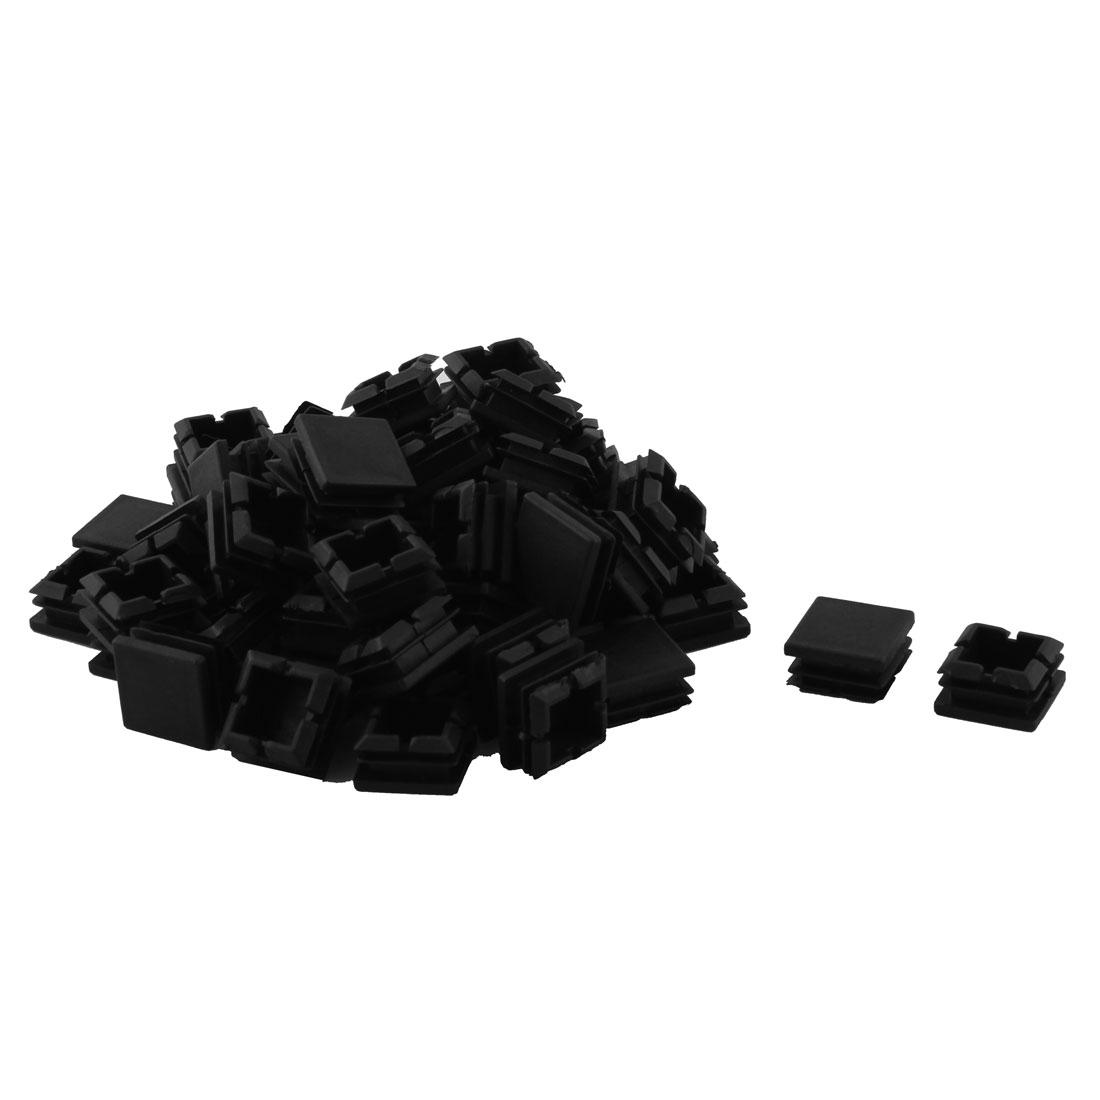 Plastic Square Design Tube Insert End Blanking Cover Cap Black 25 x 25mm 60pcs